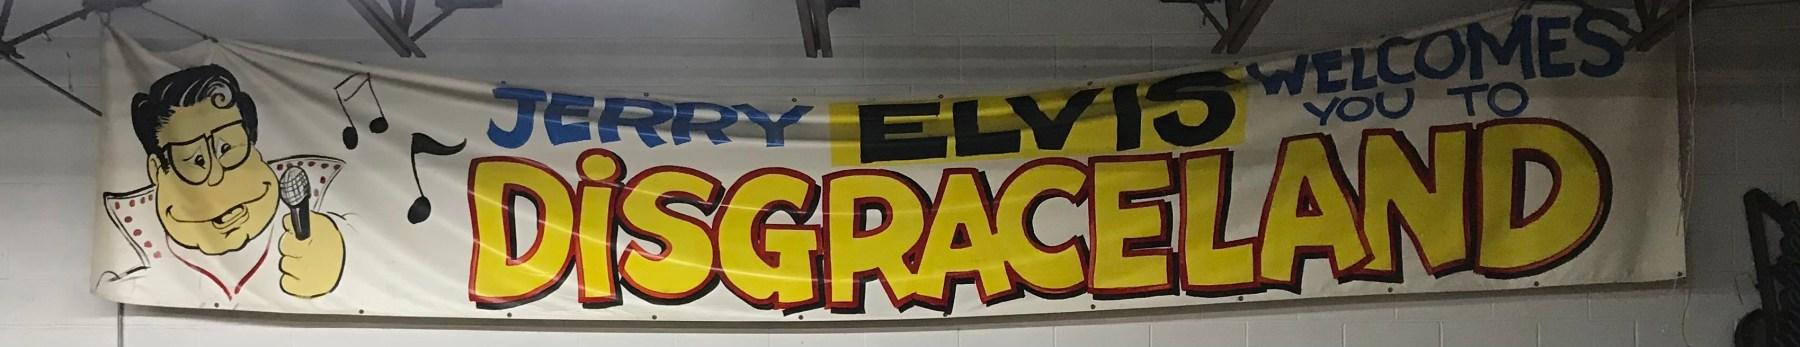 Jerry Elvis banner. Jeff Dibona photo.